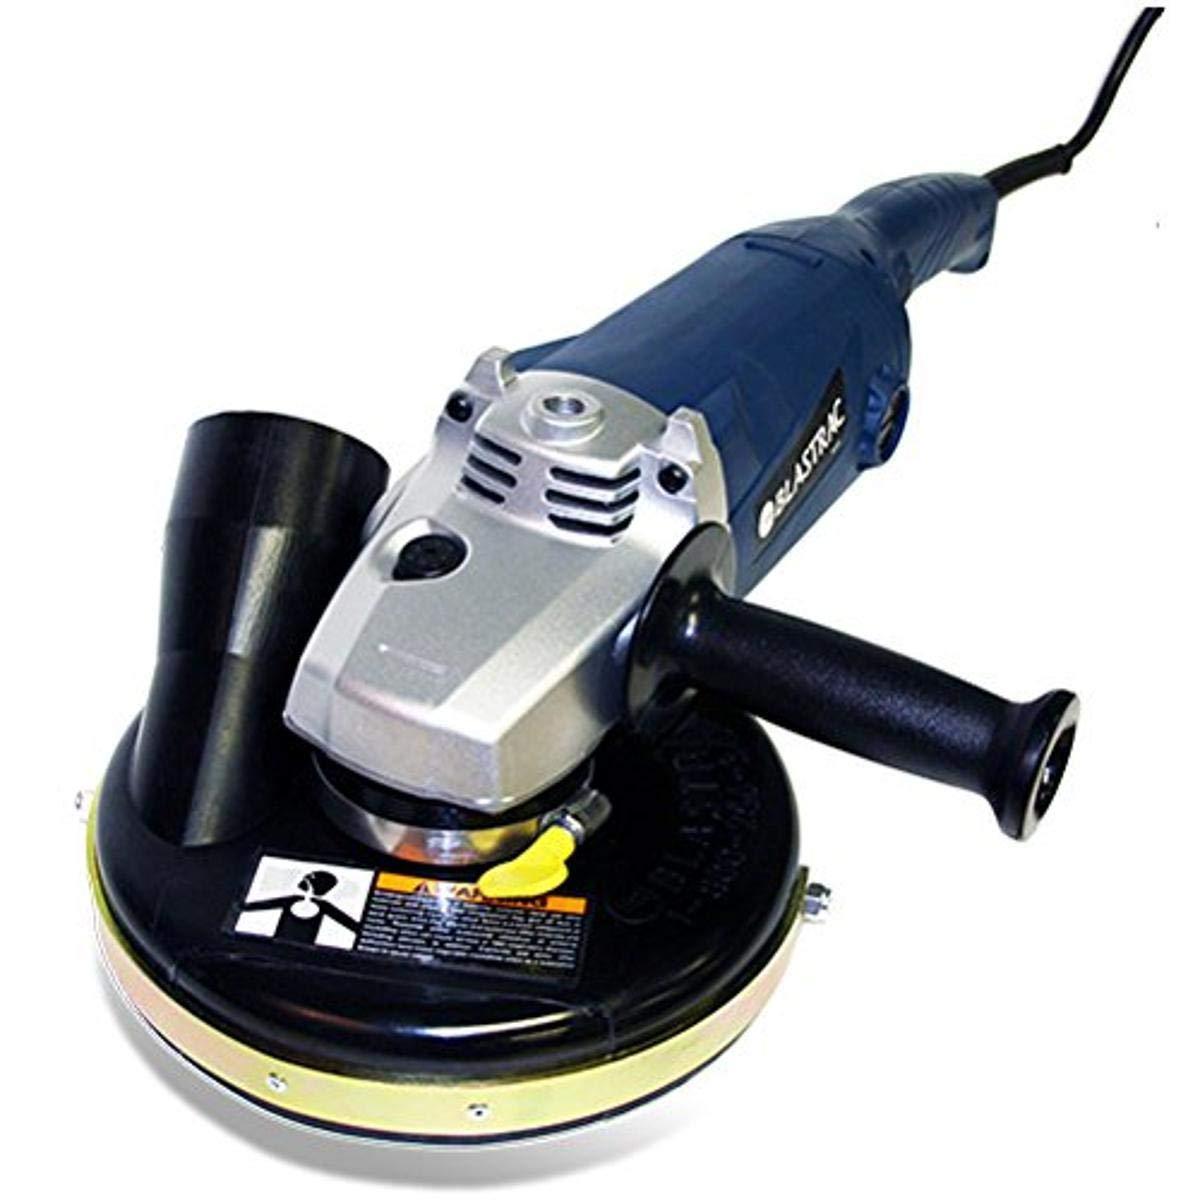 Blastrac 05 67000c Concrete Grinder Vacuum Assembly With Convertible Shroud 7 Amazon Com Industrial Scientific